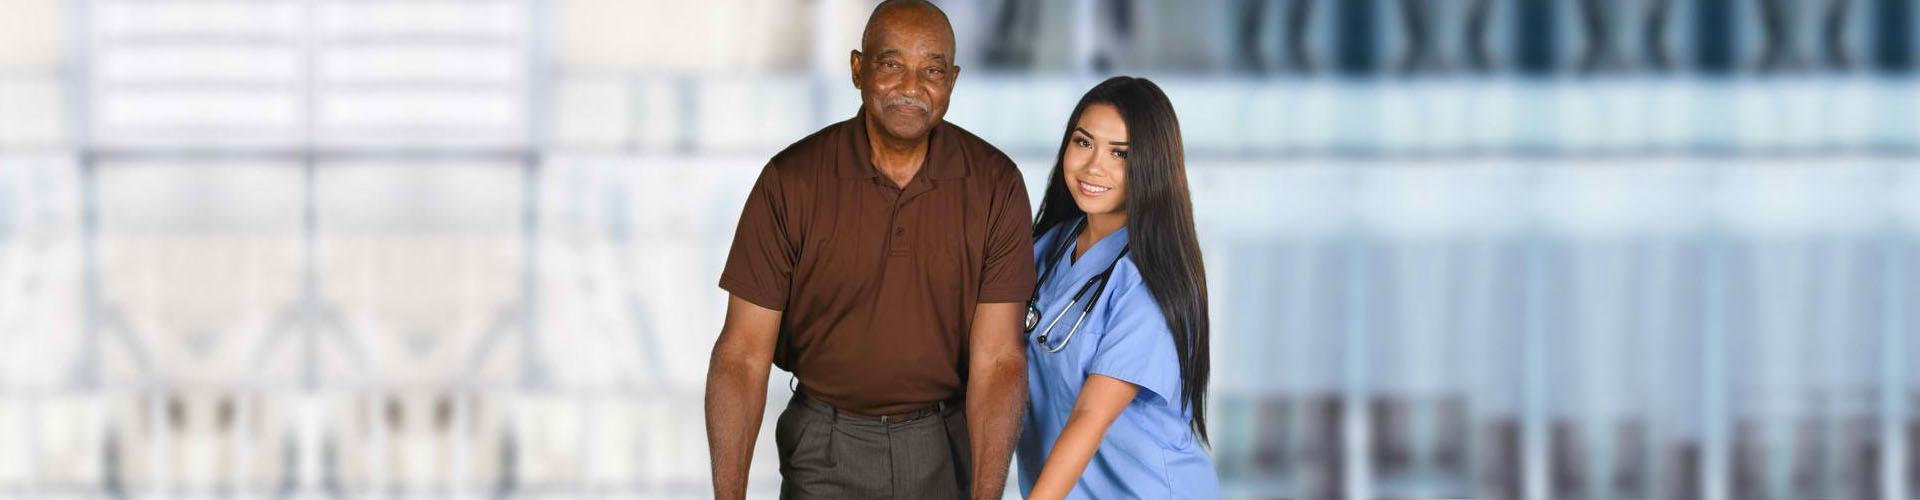 a nurse and a senior man smiling